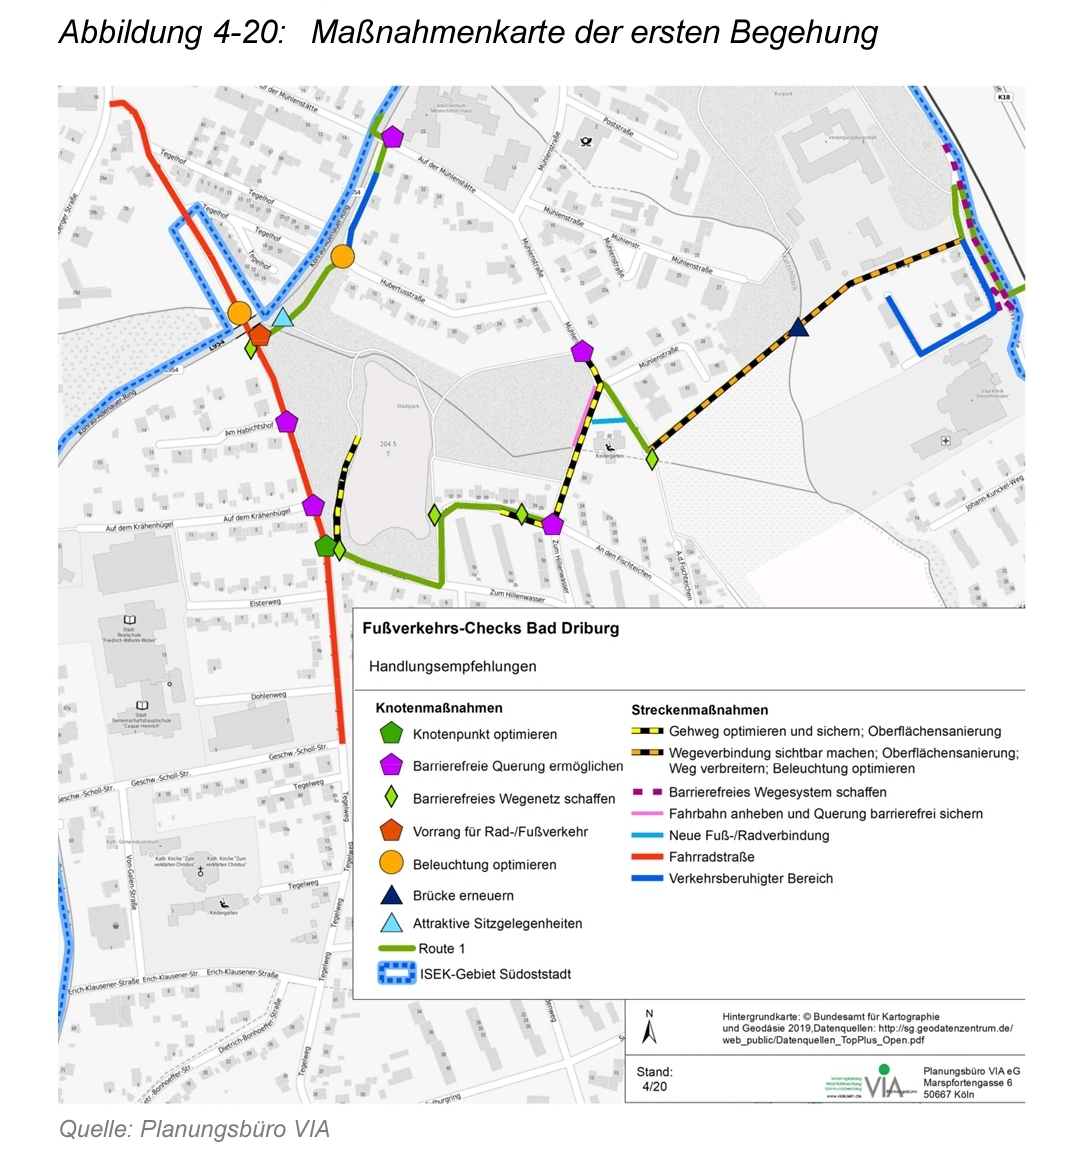 Fuss/Radweg entlang dem Konrad-Adenauer-Ring mit Überquerung des Tegelweges